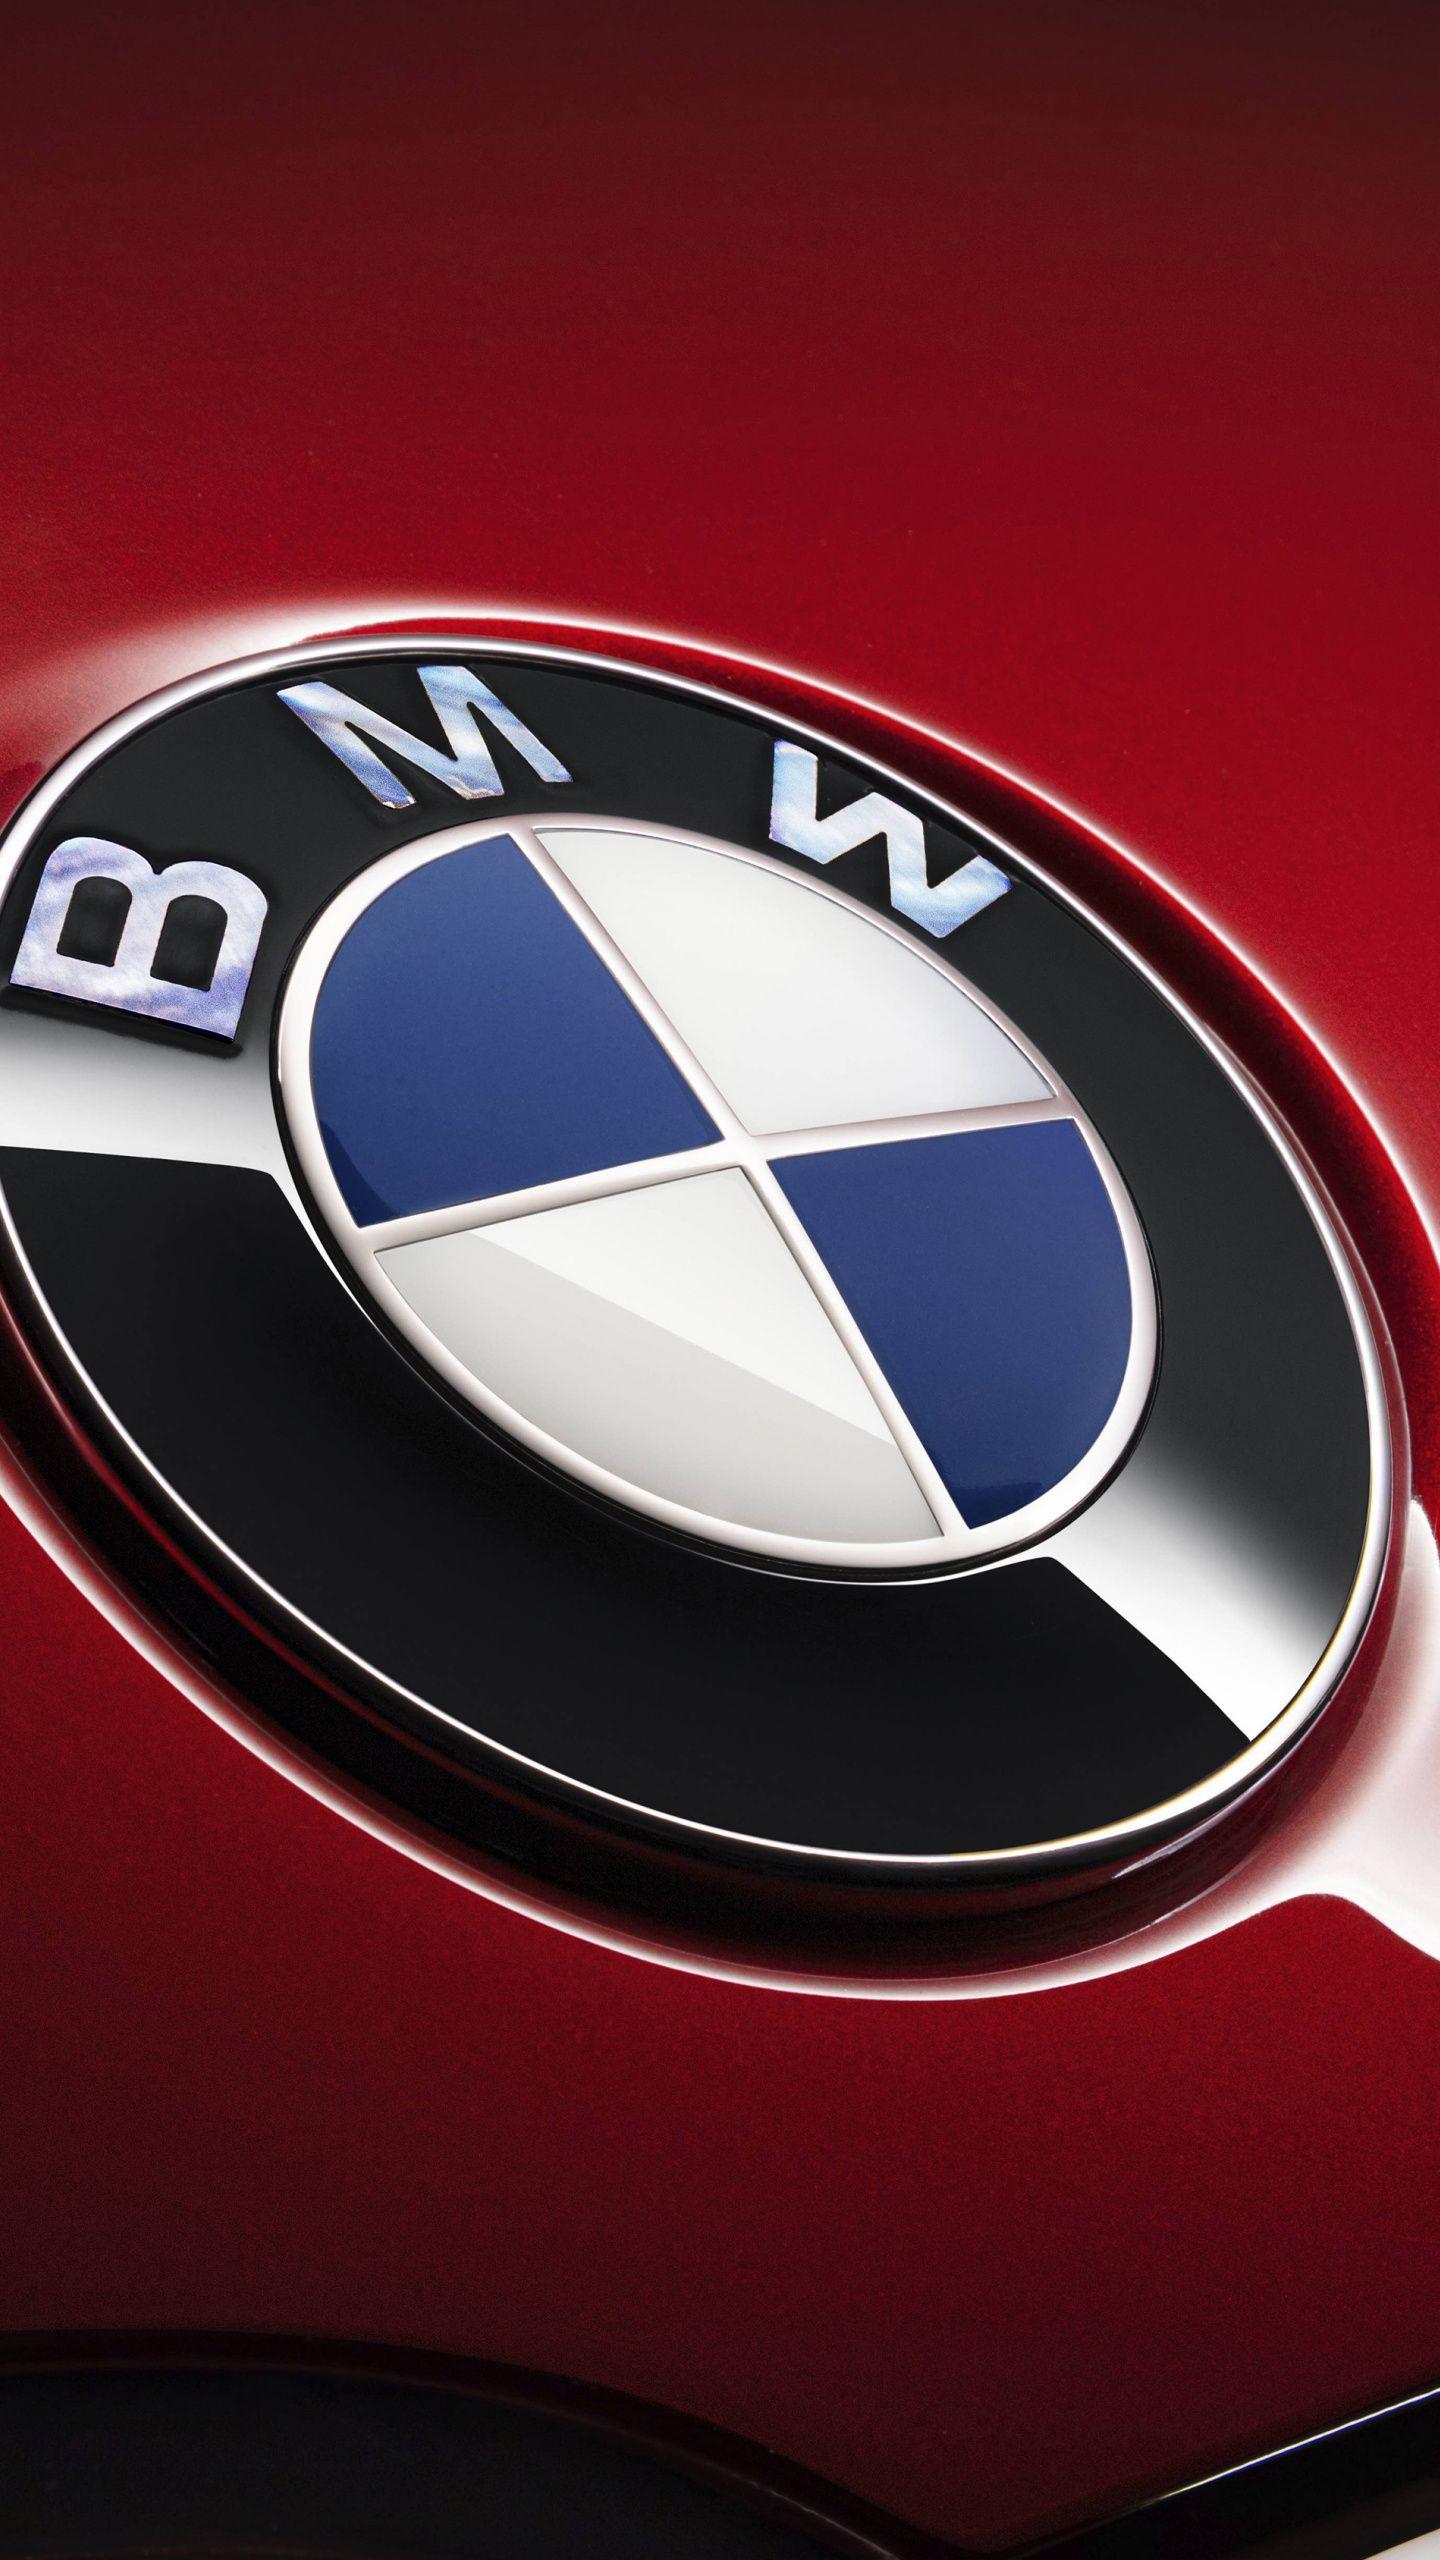 1440x2560 Red Bmw 7 Series Car Logo Wallpaper Bmw Logo Bmw 7 Series Bmw Iphone Wallpaper